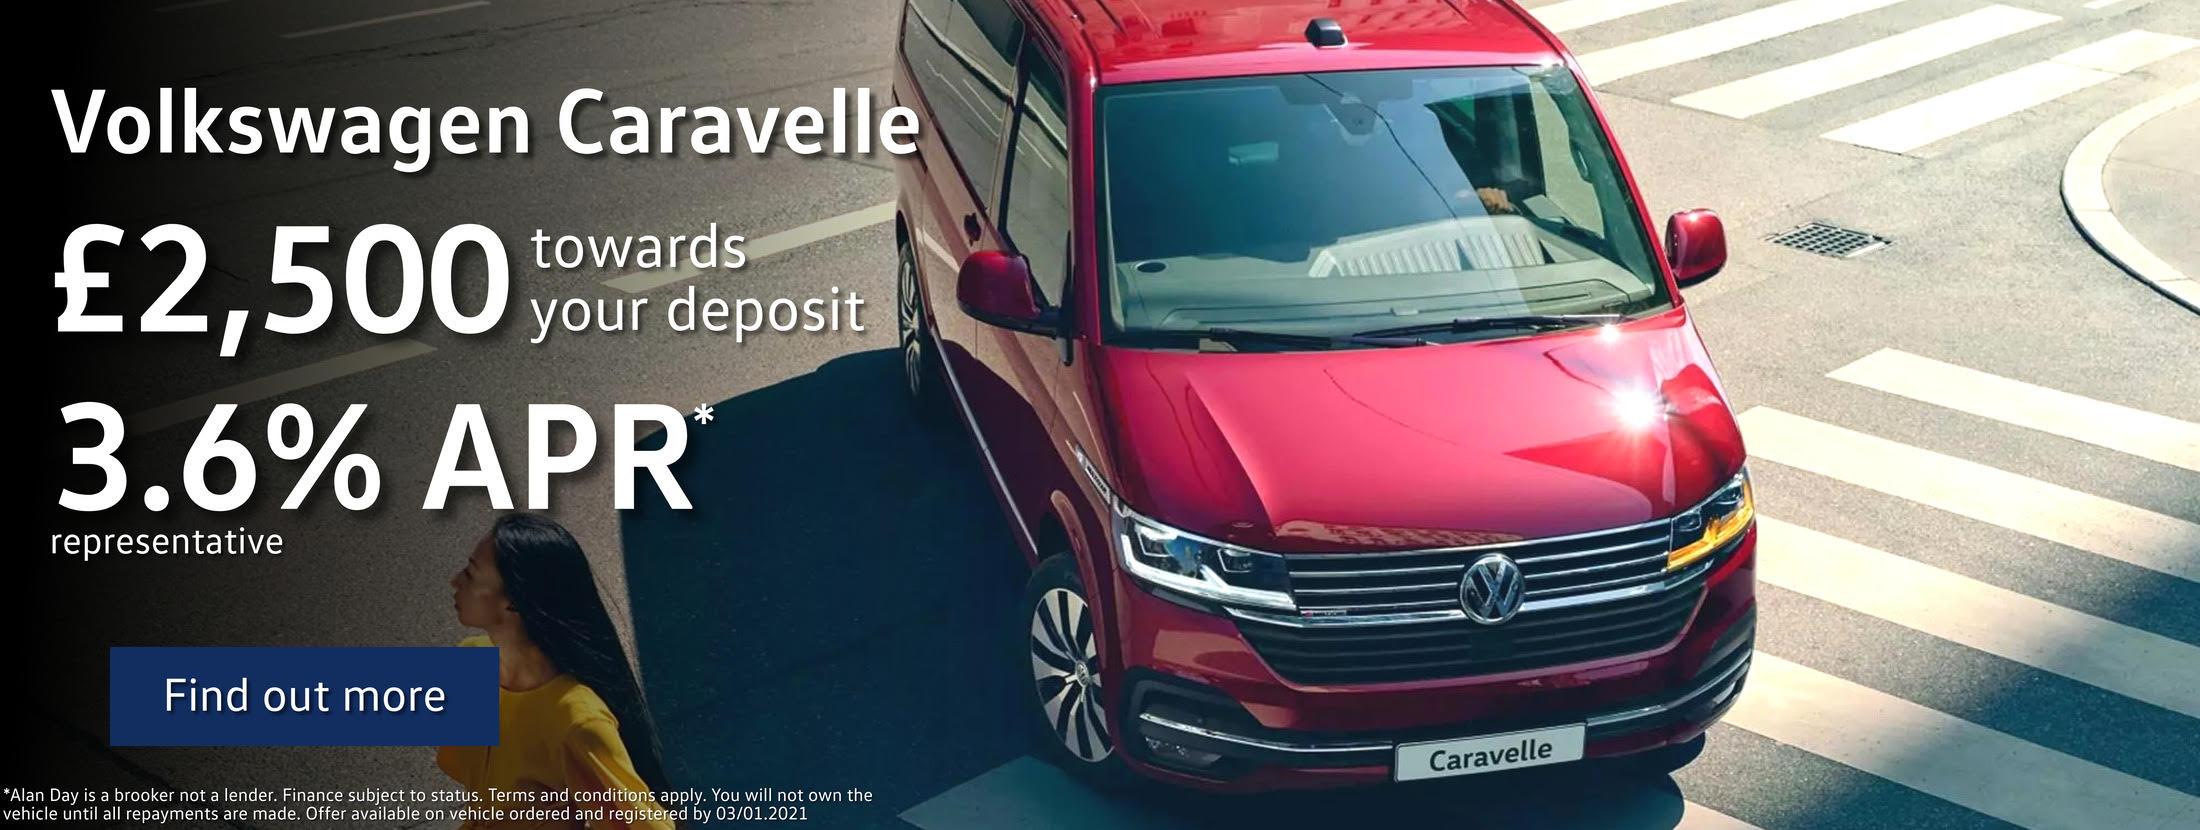 Caravelle £2500